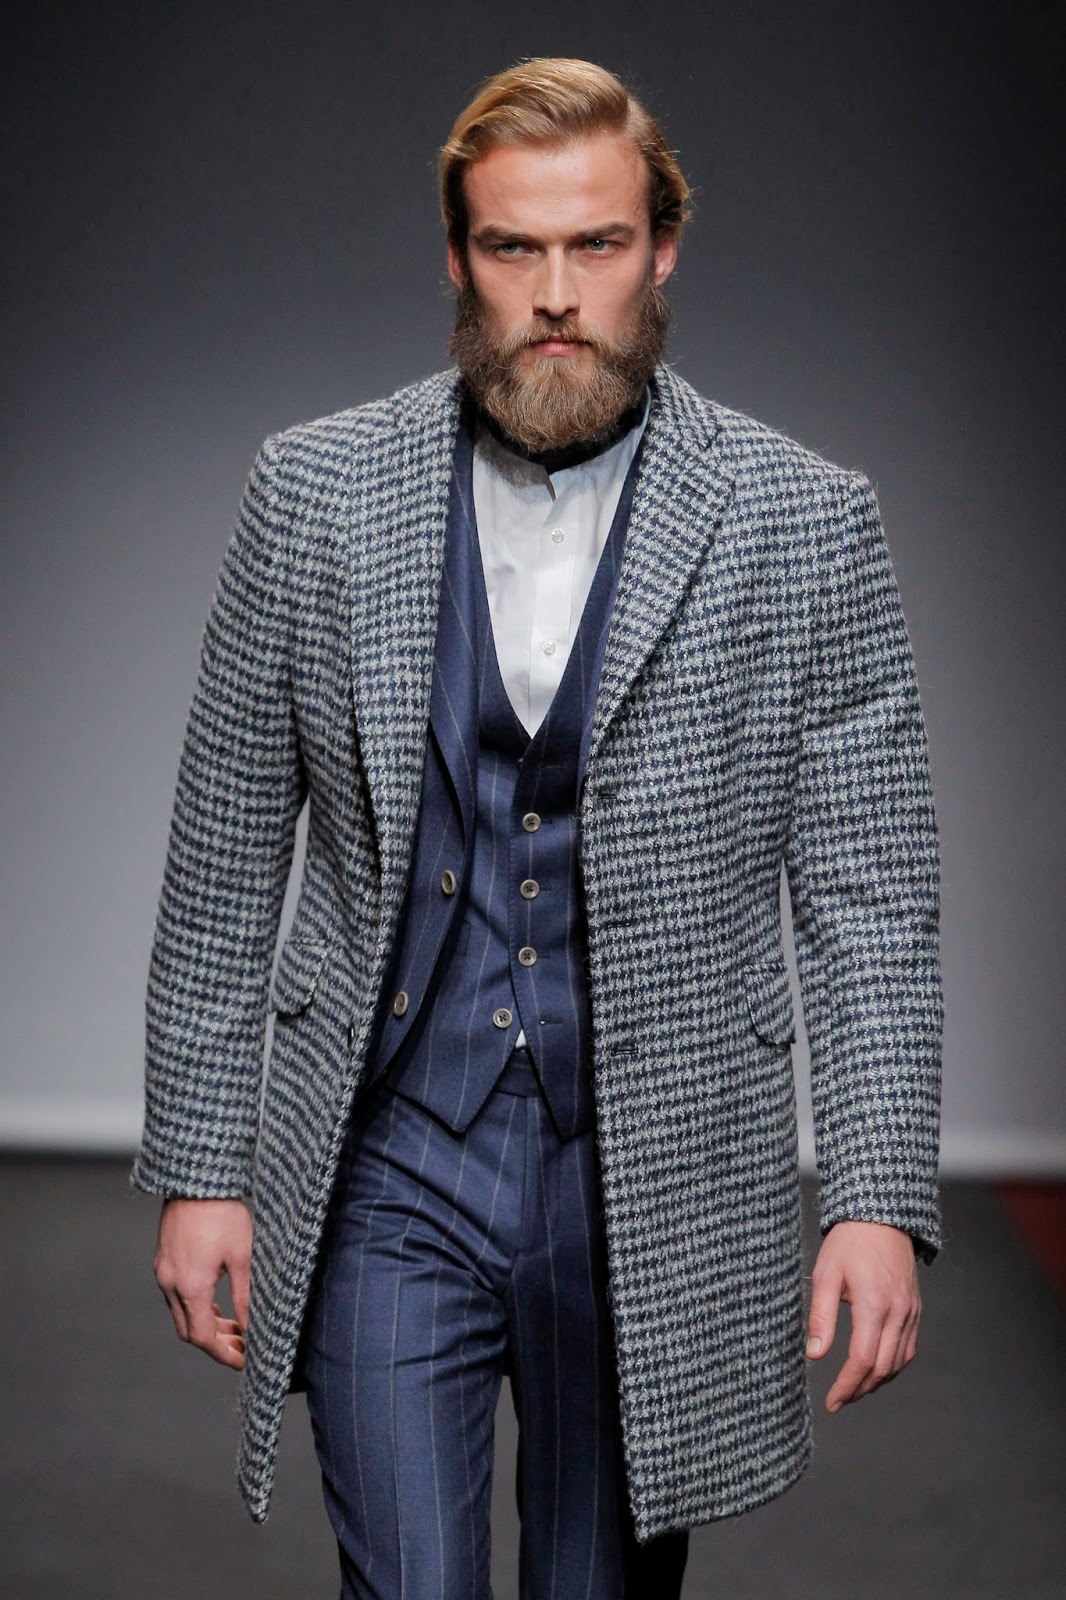 Fall 2015, Lander Urquijo, Men, menswear, MFSHOW, otoño invierno, sastre, sastrería, tailor, Suits and Shirts,